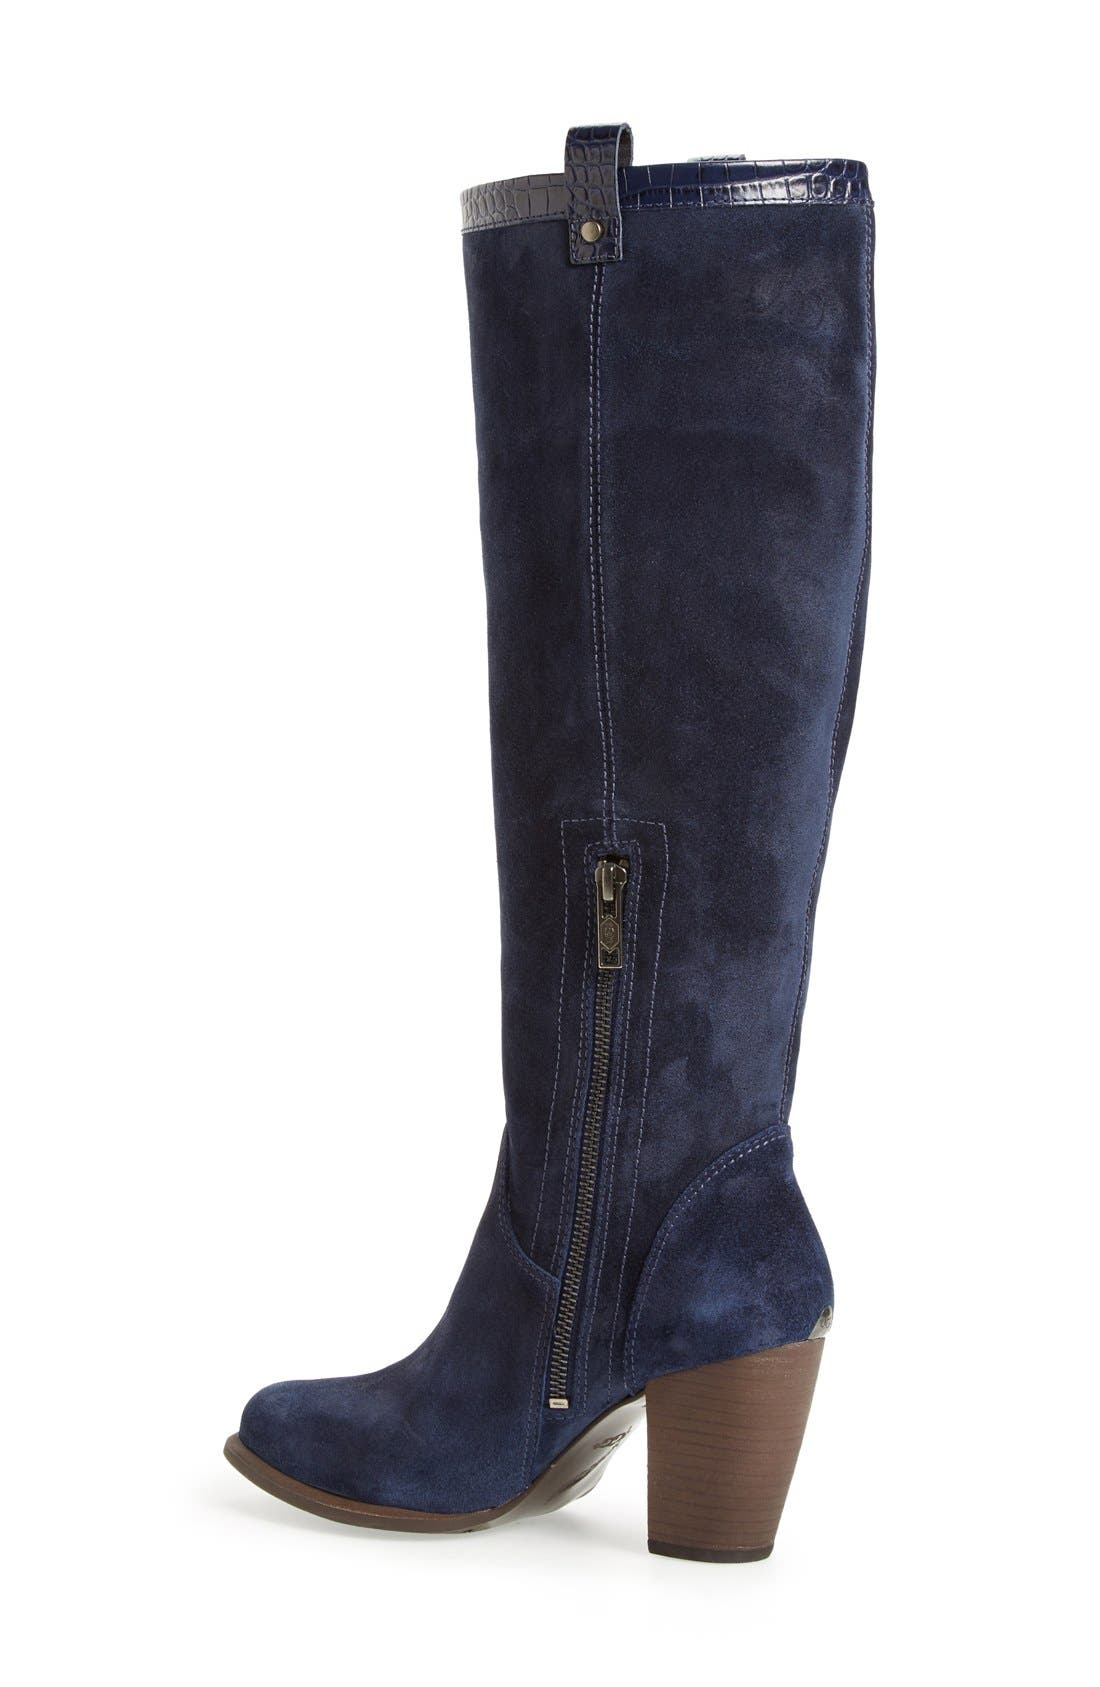 Alternate Image 2  - UGG® 'Ava Croco' Tall Suede Boot (Women)